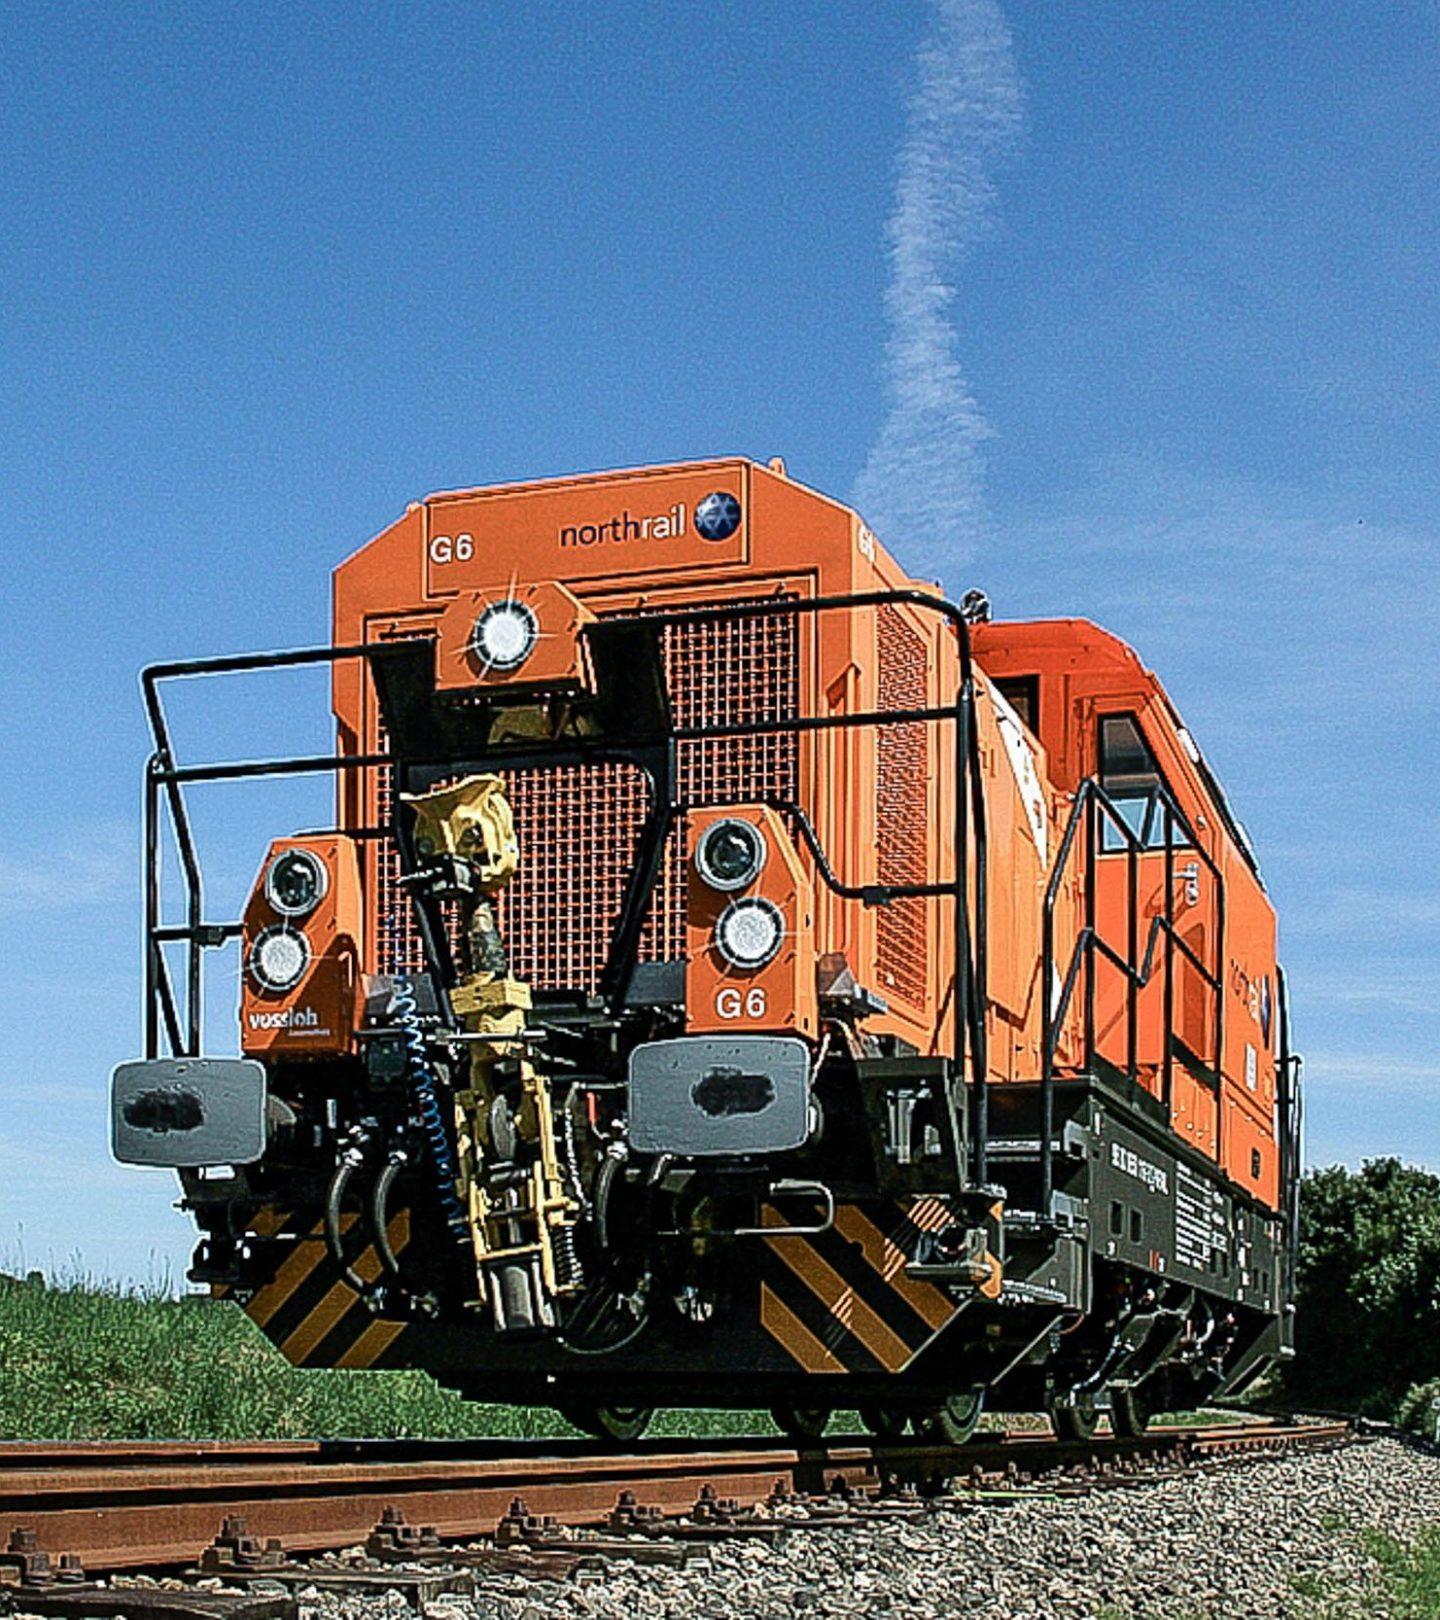 Northrail-Lokomotive auf Gleis